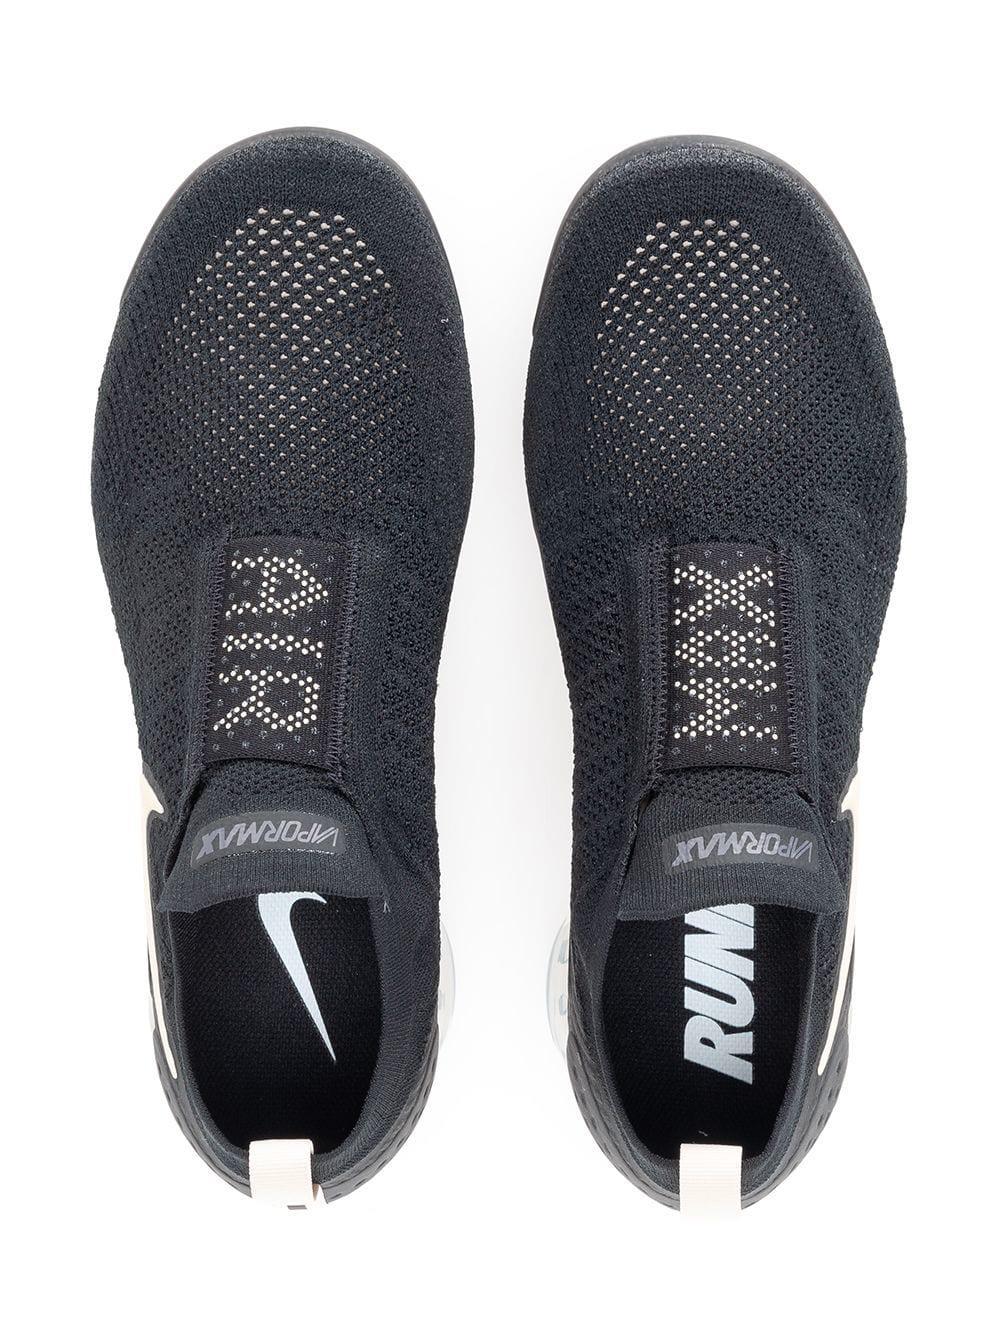 c110ddfc0f37 Nike - Black Air Vapormax Flyknit Moc 2 Sneakers for Men - Lyst. View  fullscreen